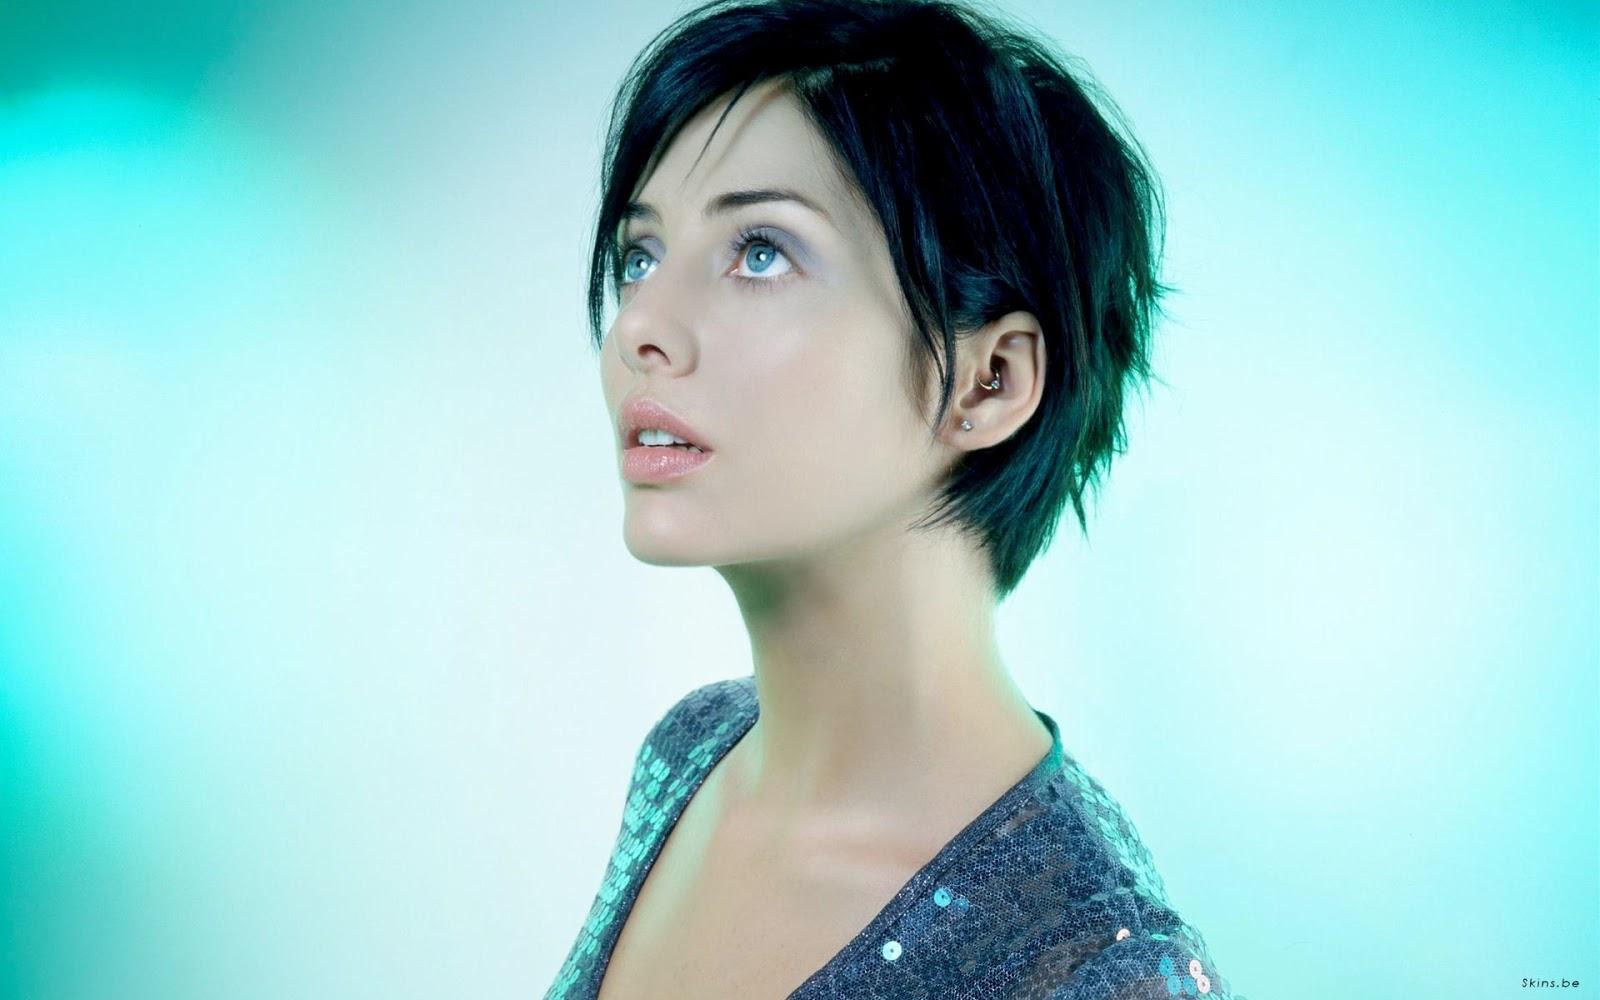 STARS *** TEAM: Natalie Imbruglia - Torn ( Flac )